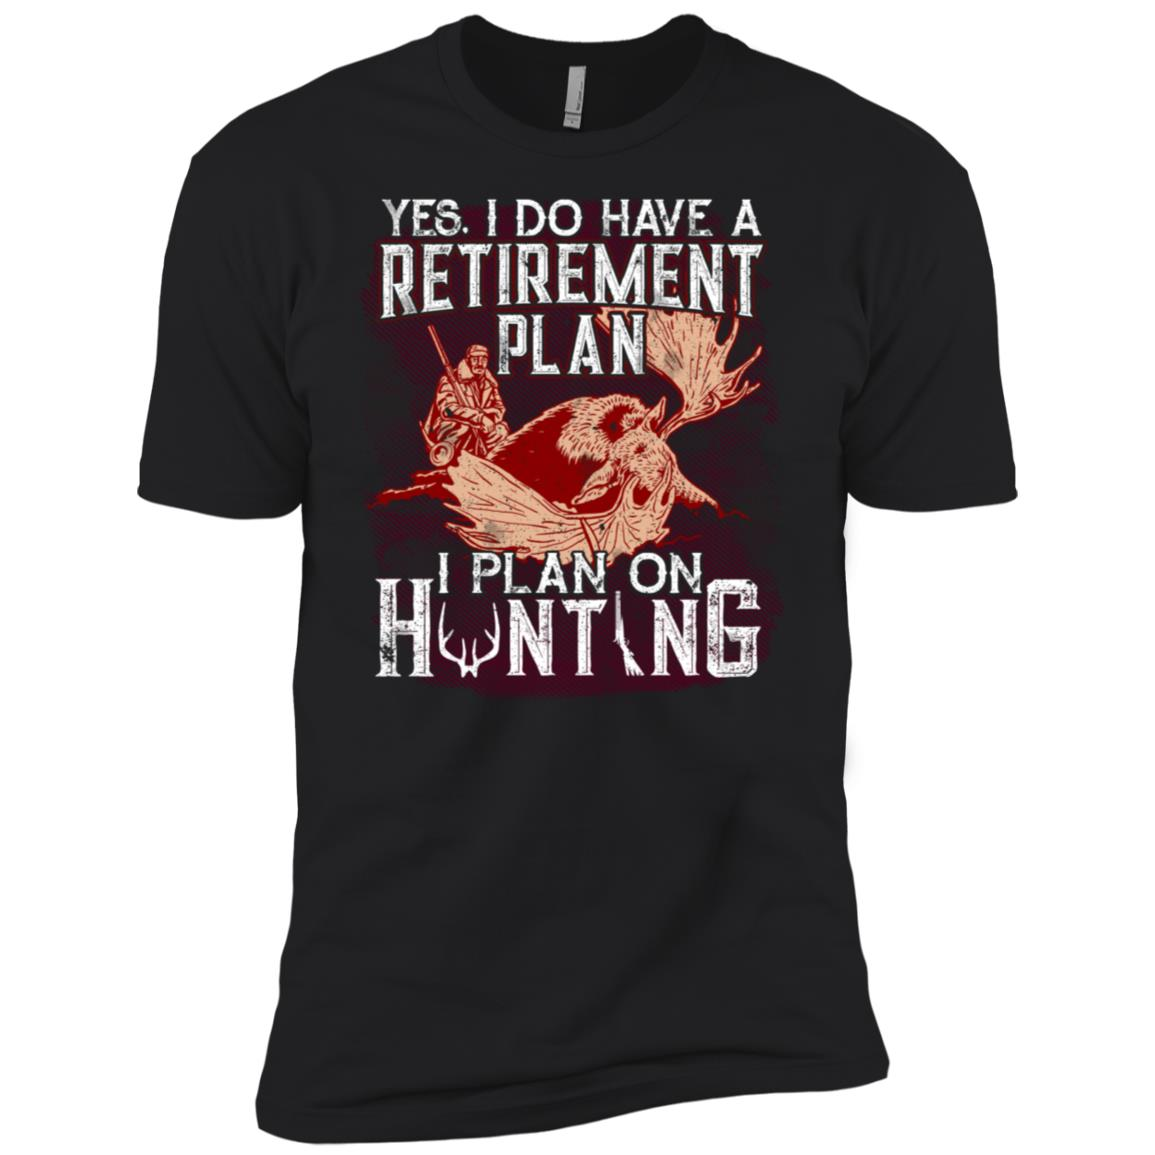 Hunting Retirement Tee I Do Have Retirement Plan Men Short Sleeve T-Shirt